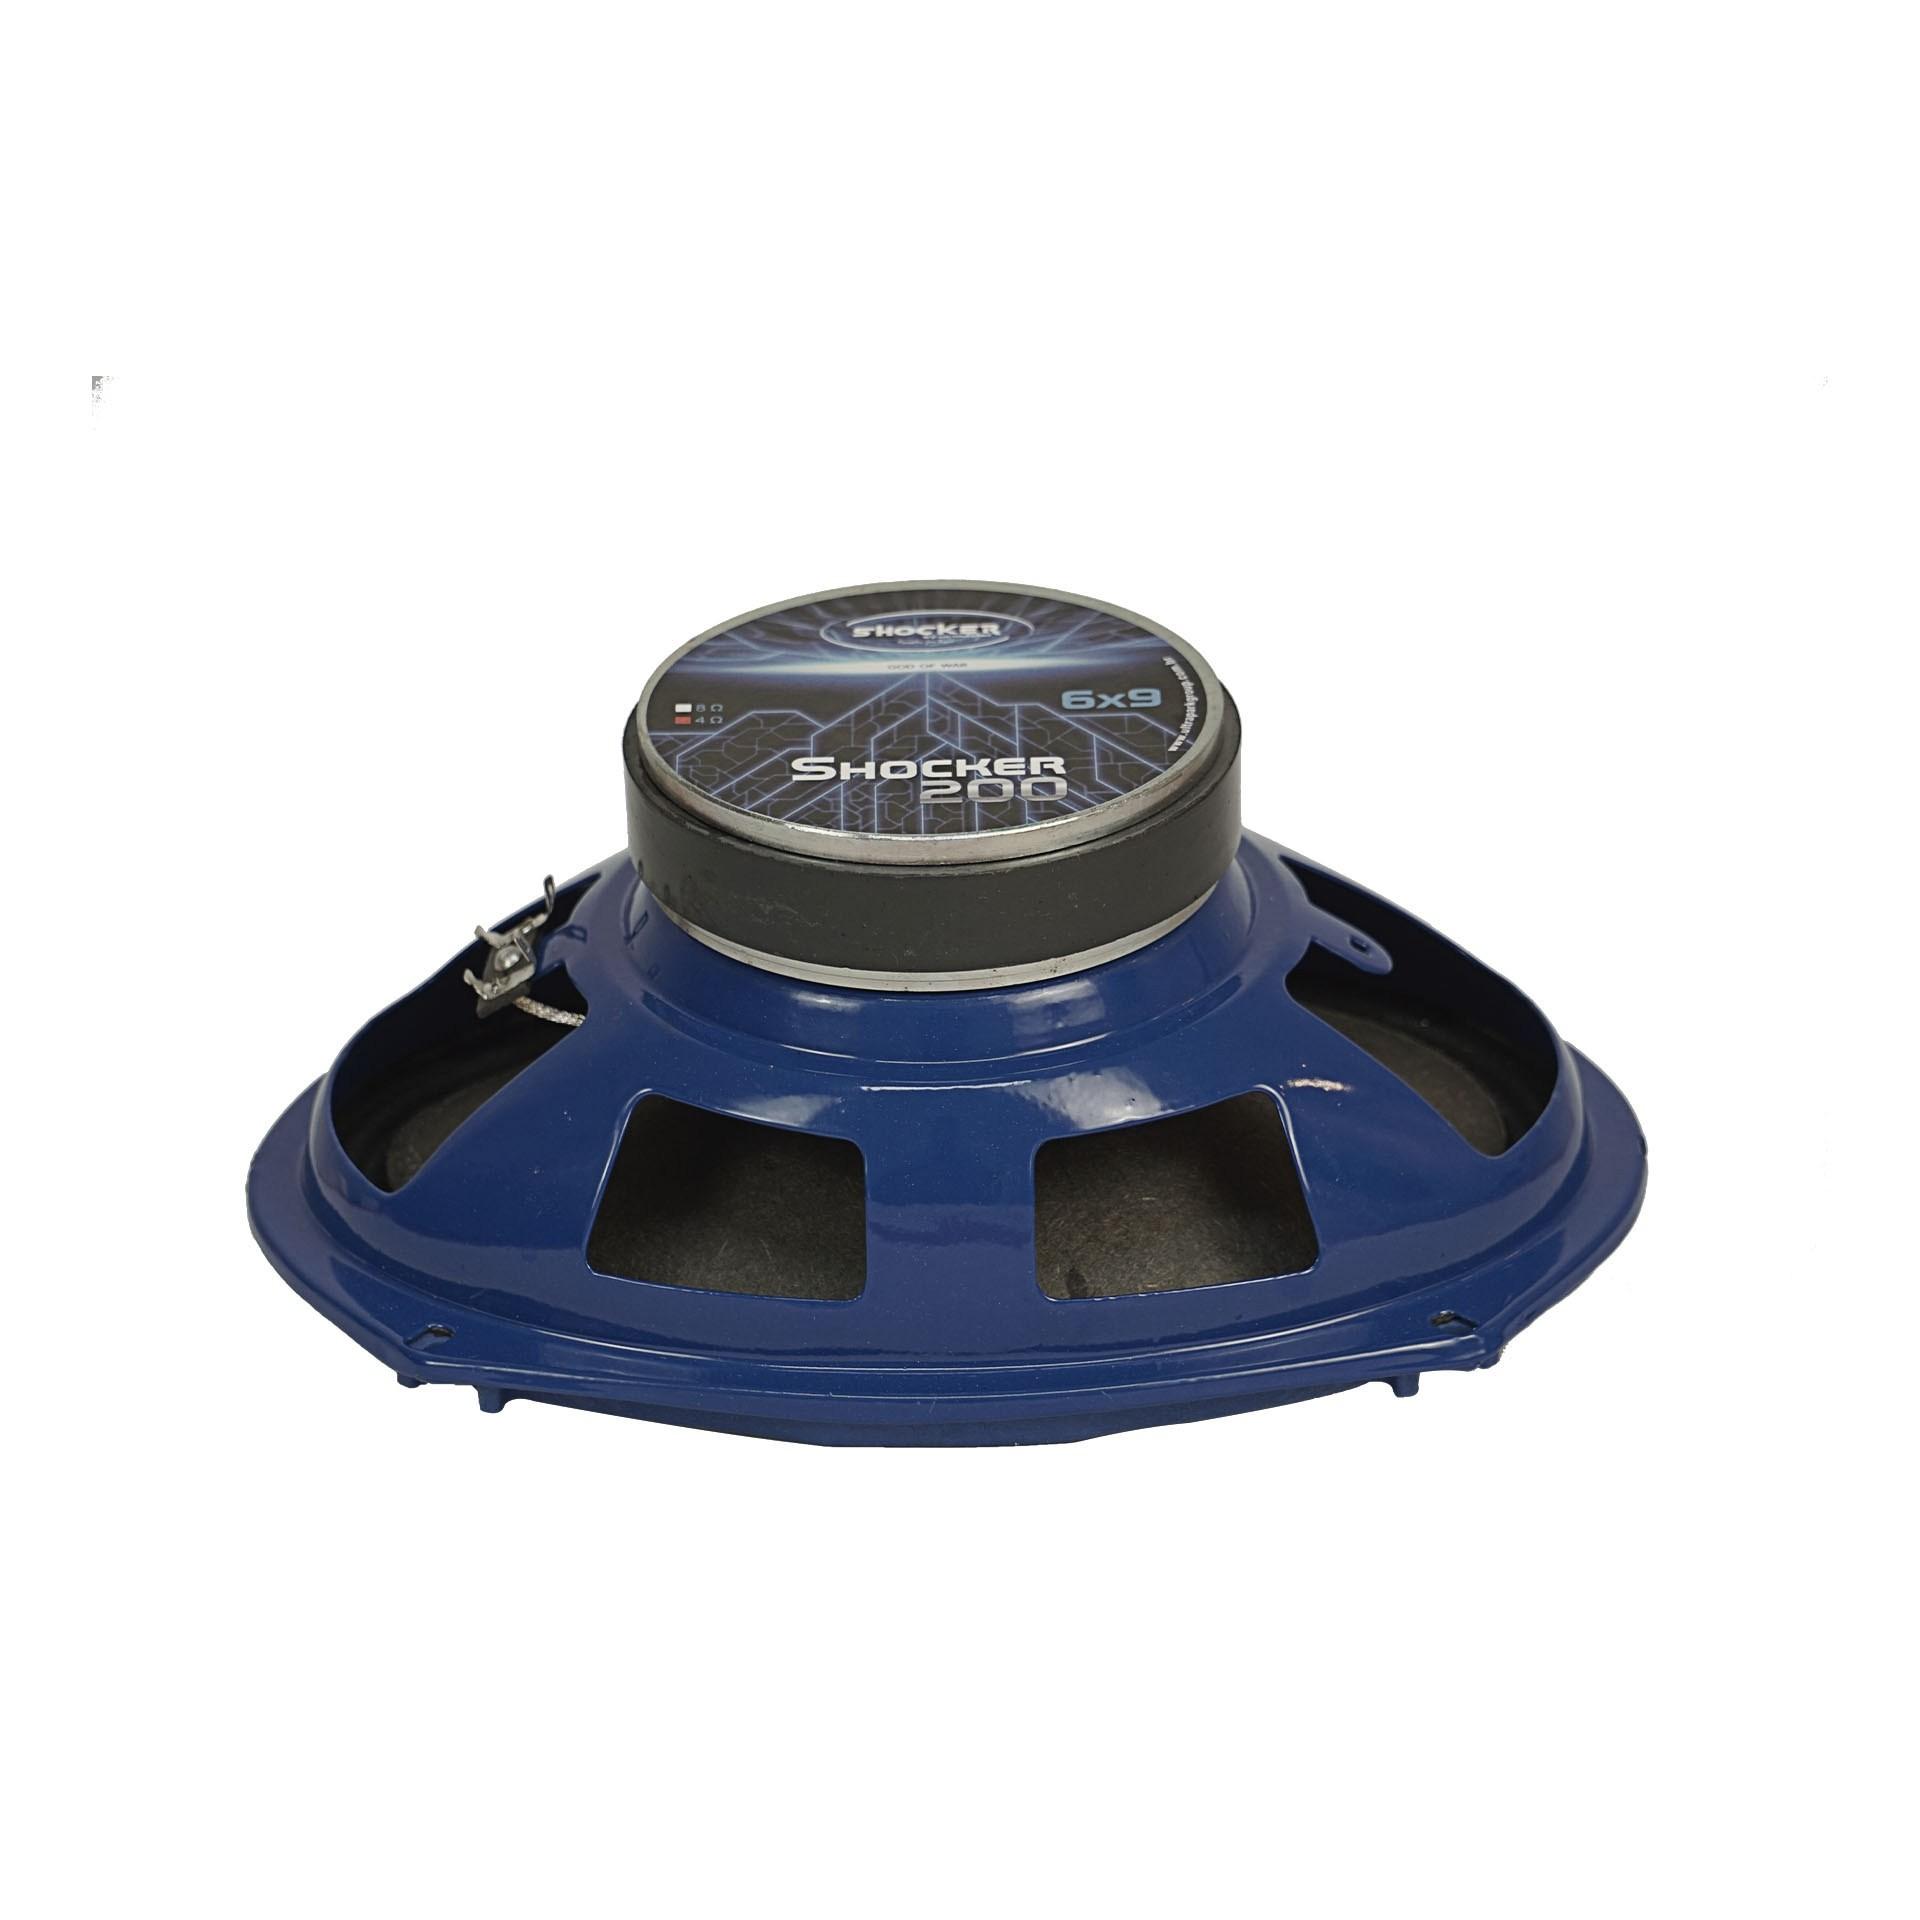 Kit Par Mid Range Shocker Azul 6x9 Polegadas 200 Rms 4 Ohms